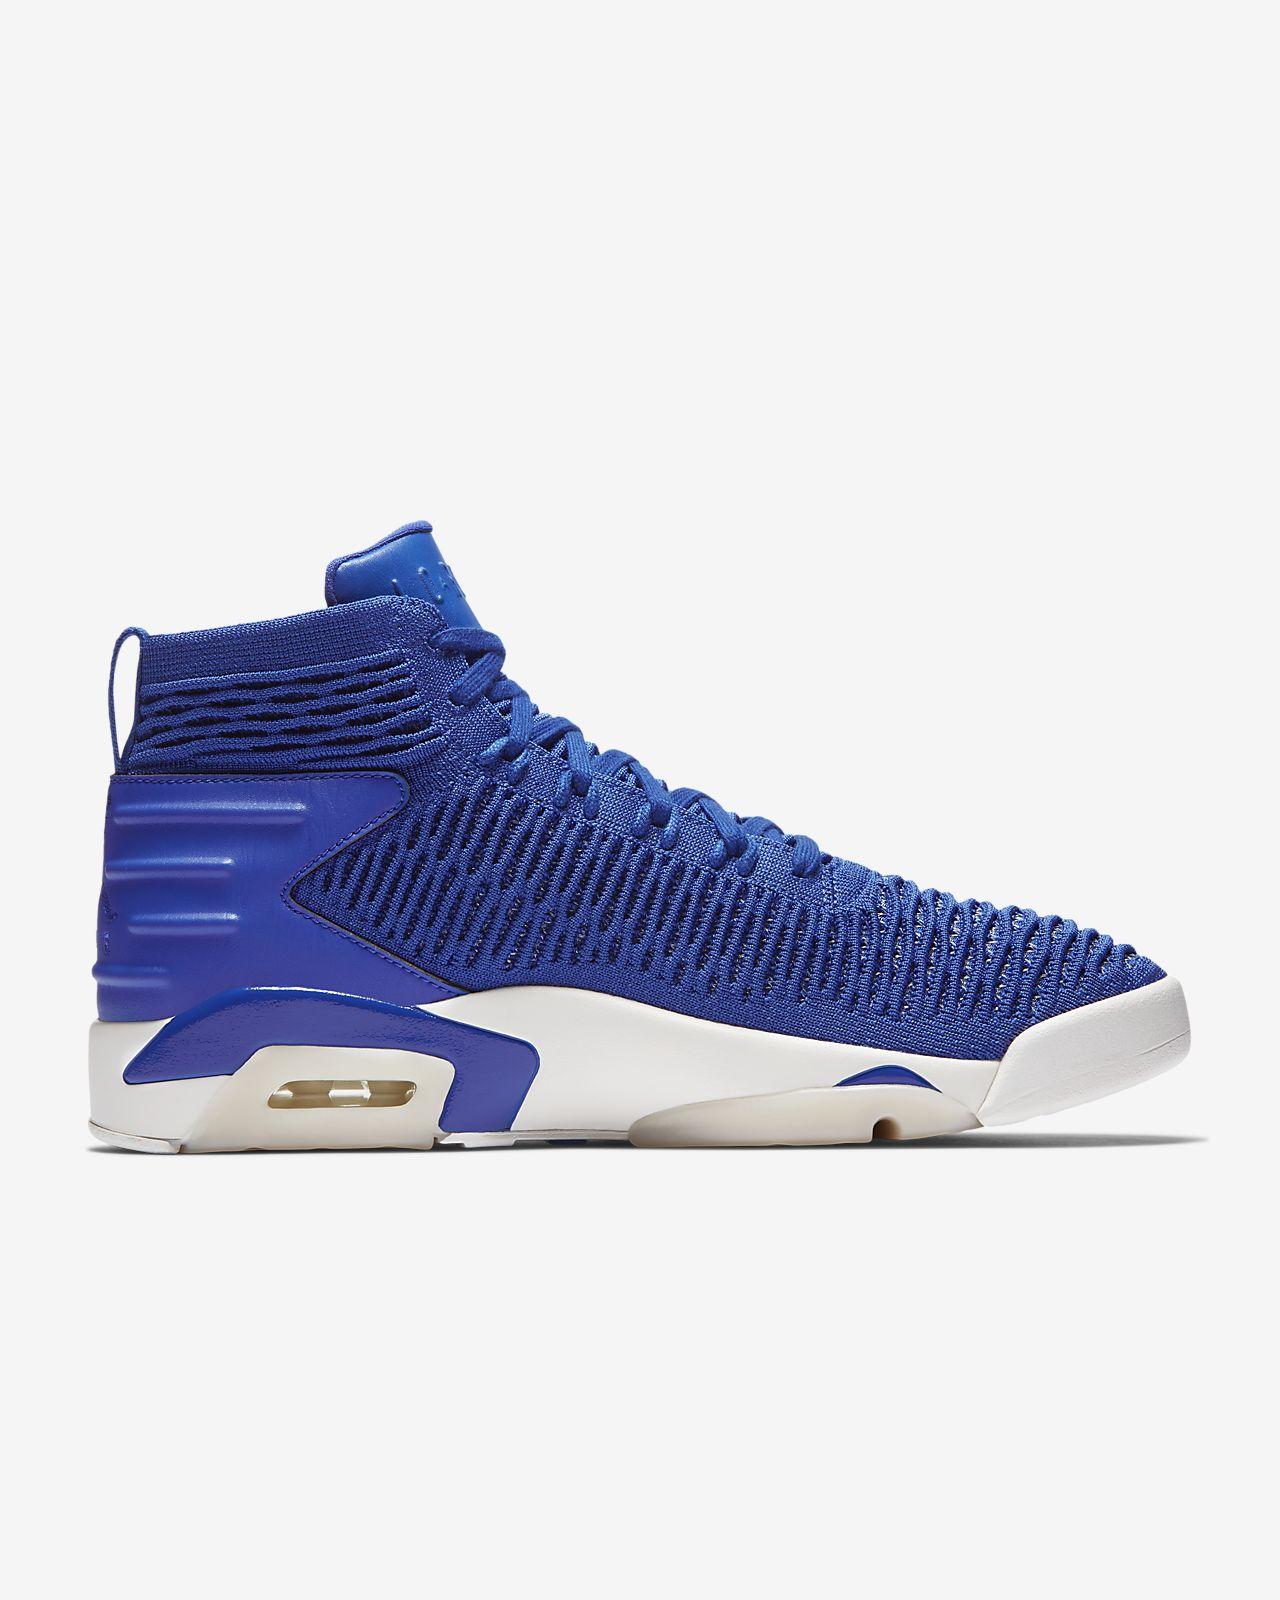 4144433e2d0 Jordan Flyknit Elevation 23 Men's Shoe. Nike.com GB